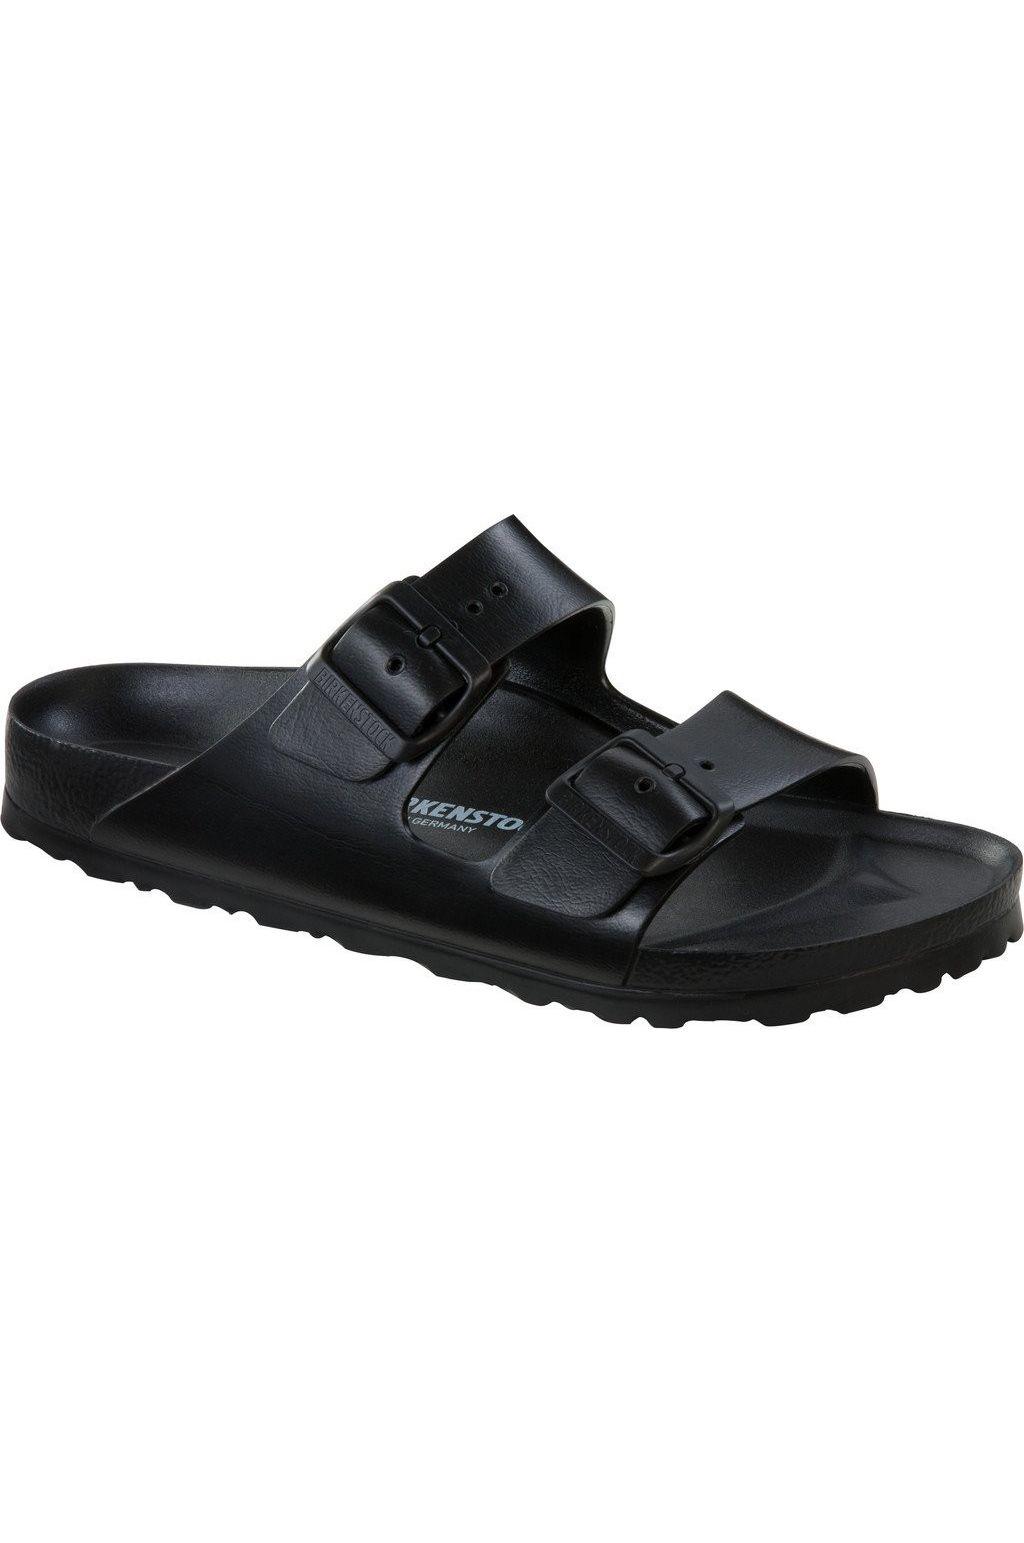 Birkenstock Sandals ARIZONA EVA REGULAR Black